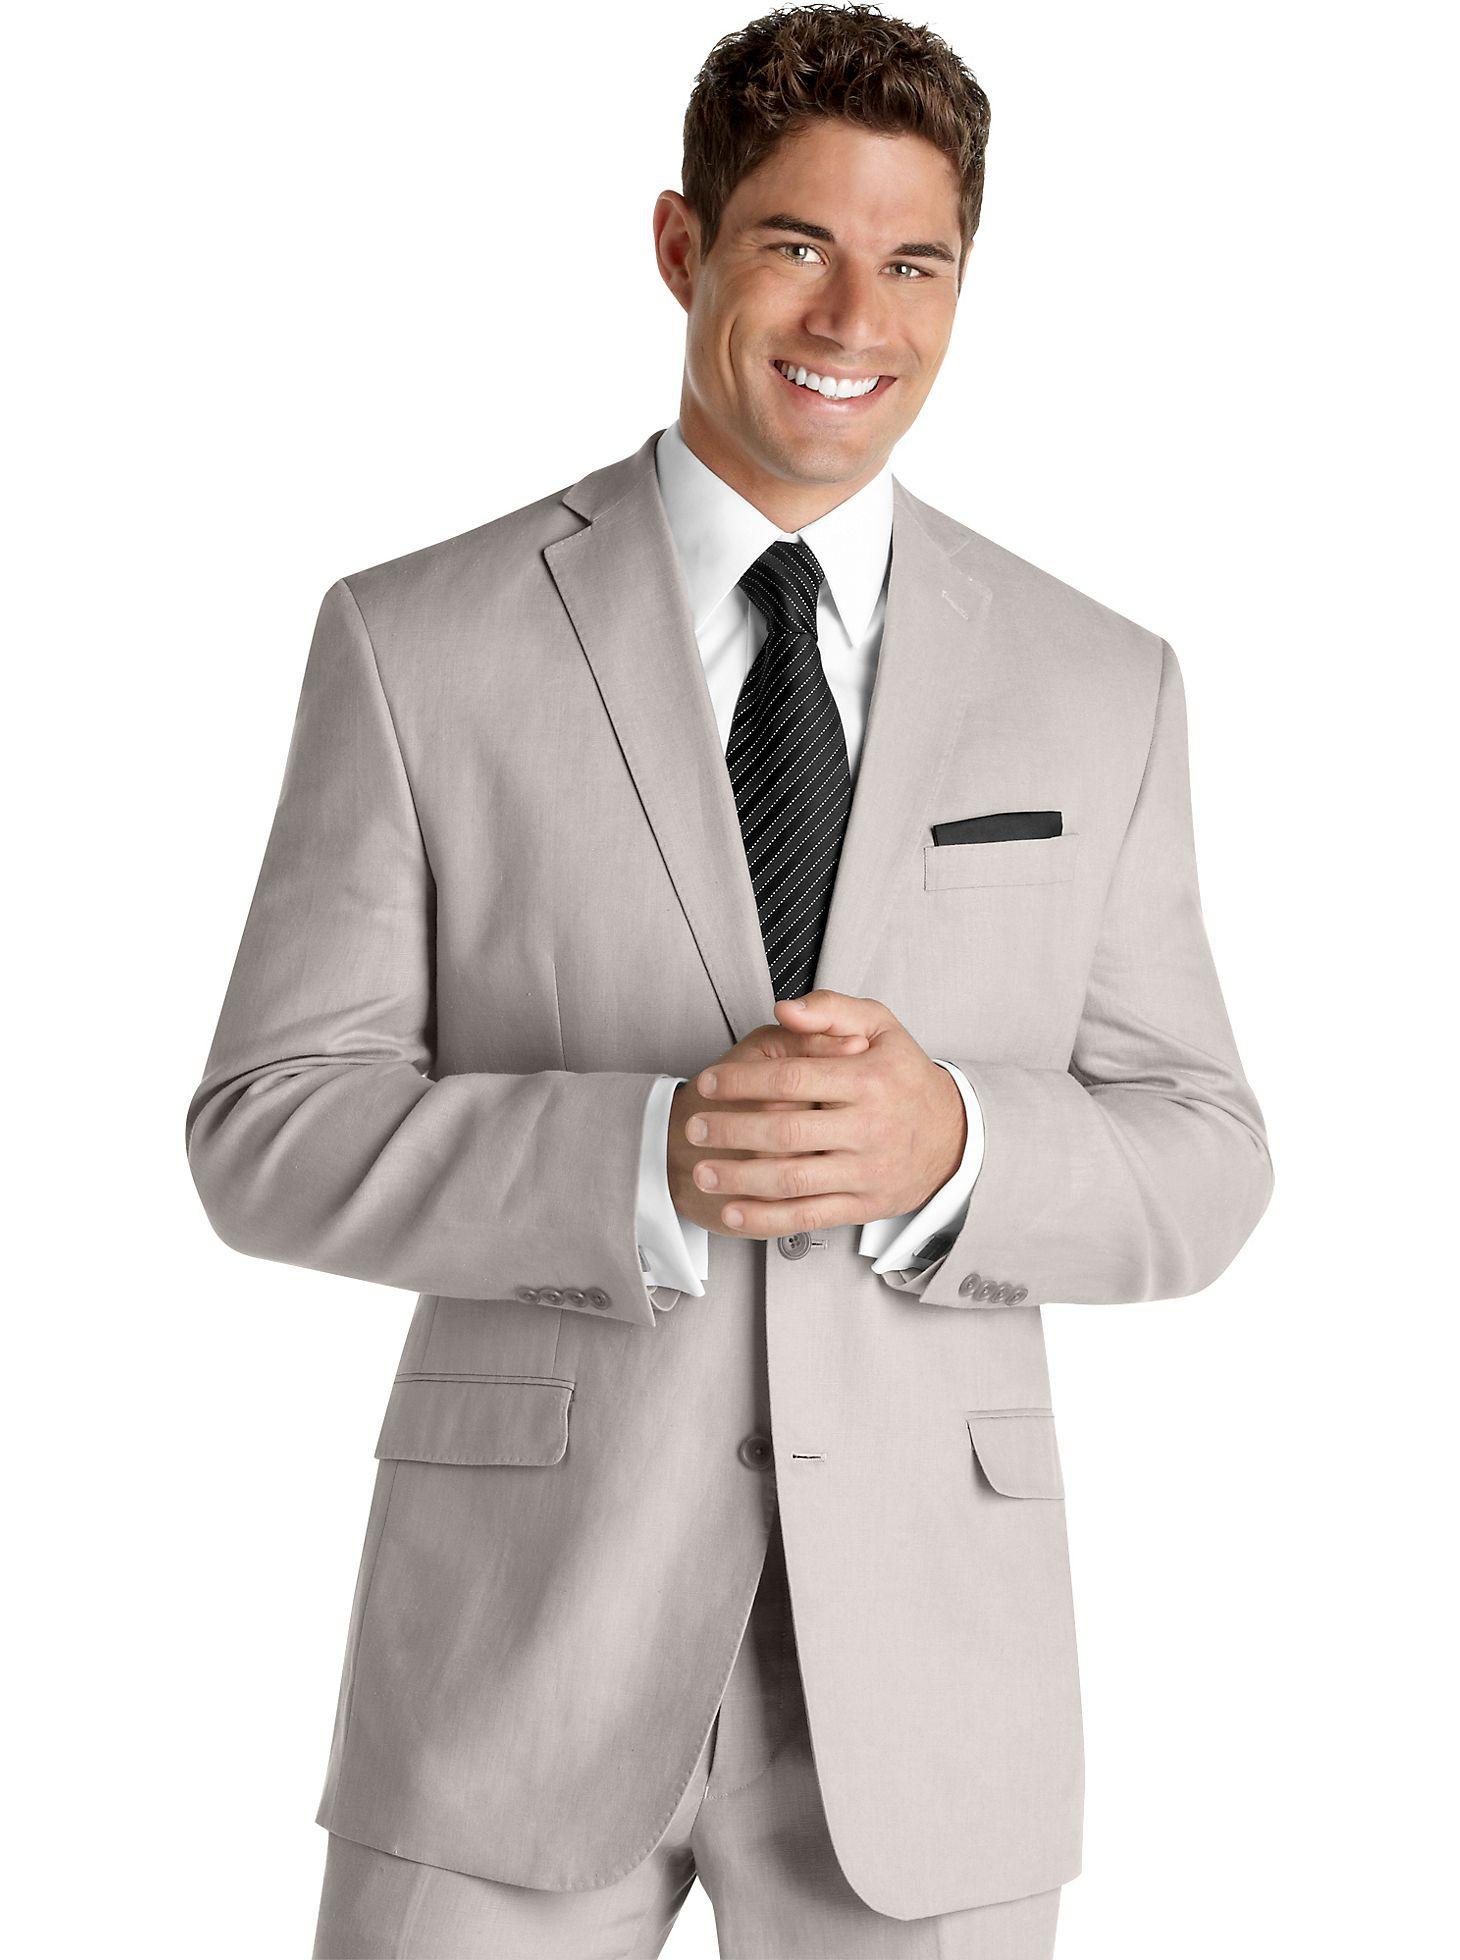 Light grey linen suit for the gentlemen ... an option for warm ...